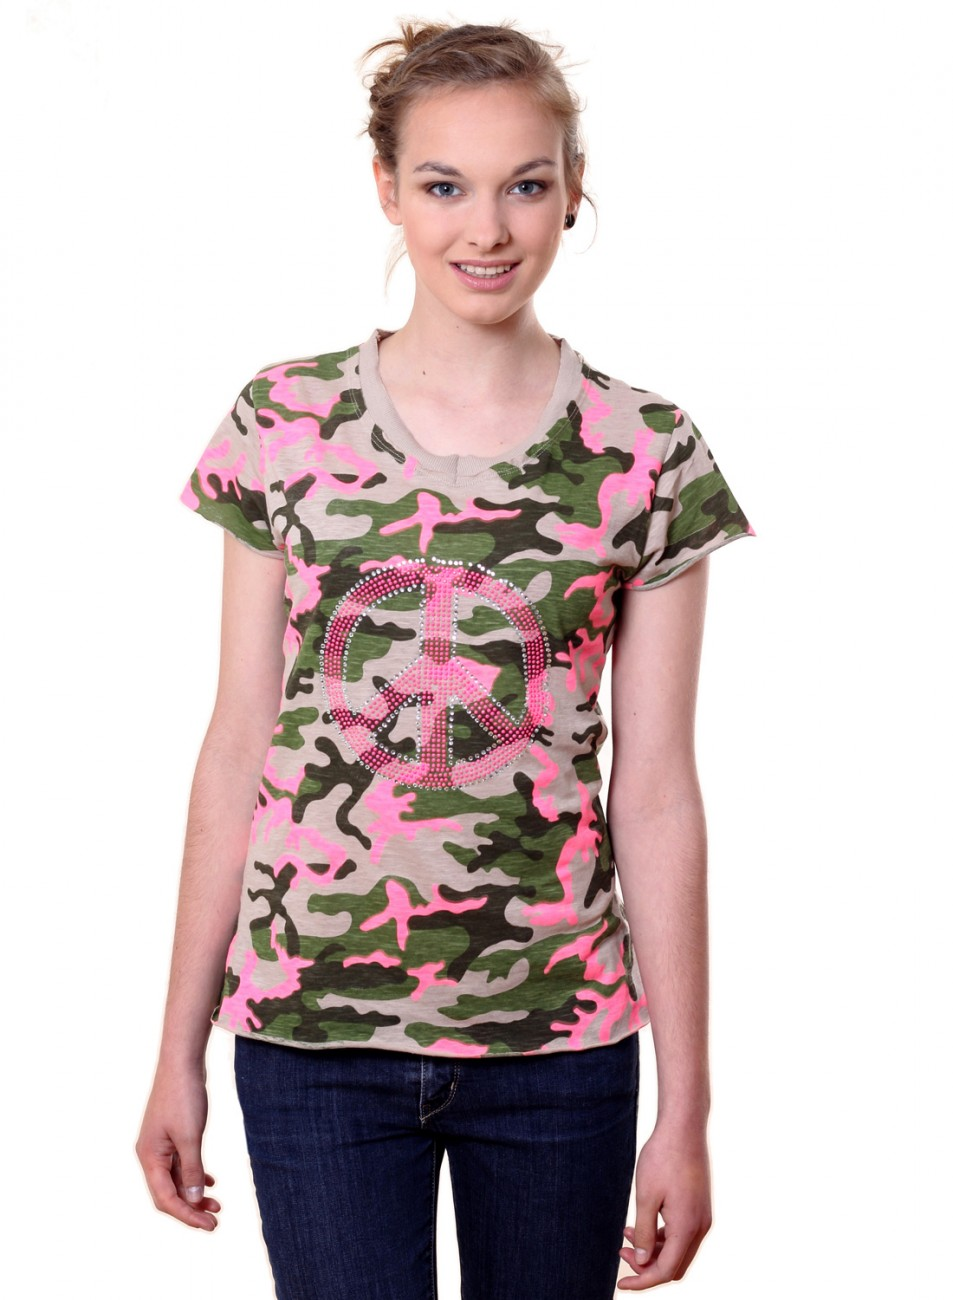 caspar damen shirt camouflage peace neon strass. Black Bedroom Furniture Sets. Home Design Ideas